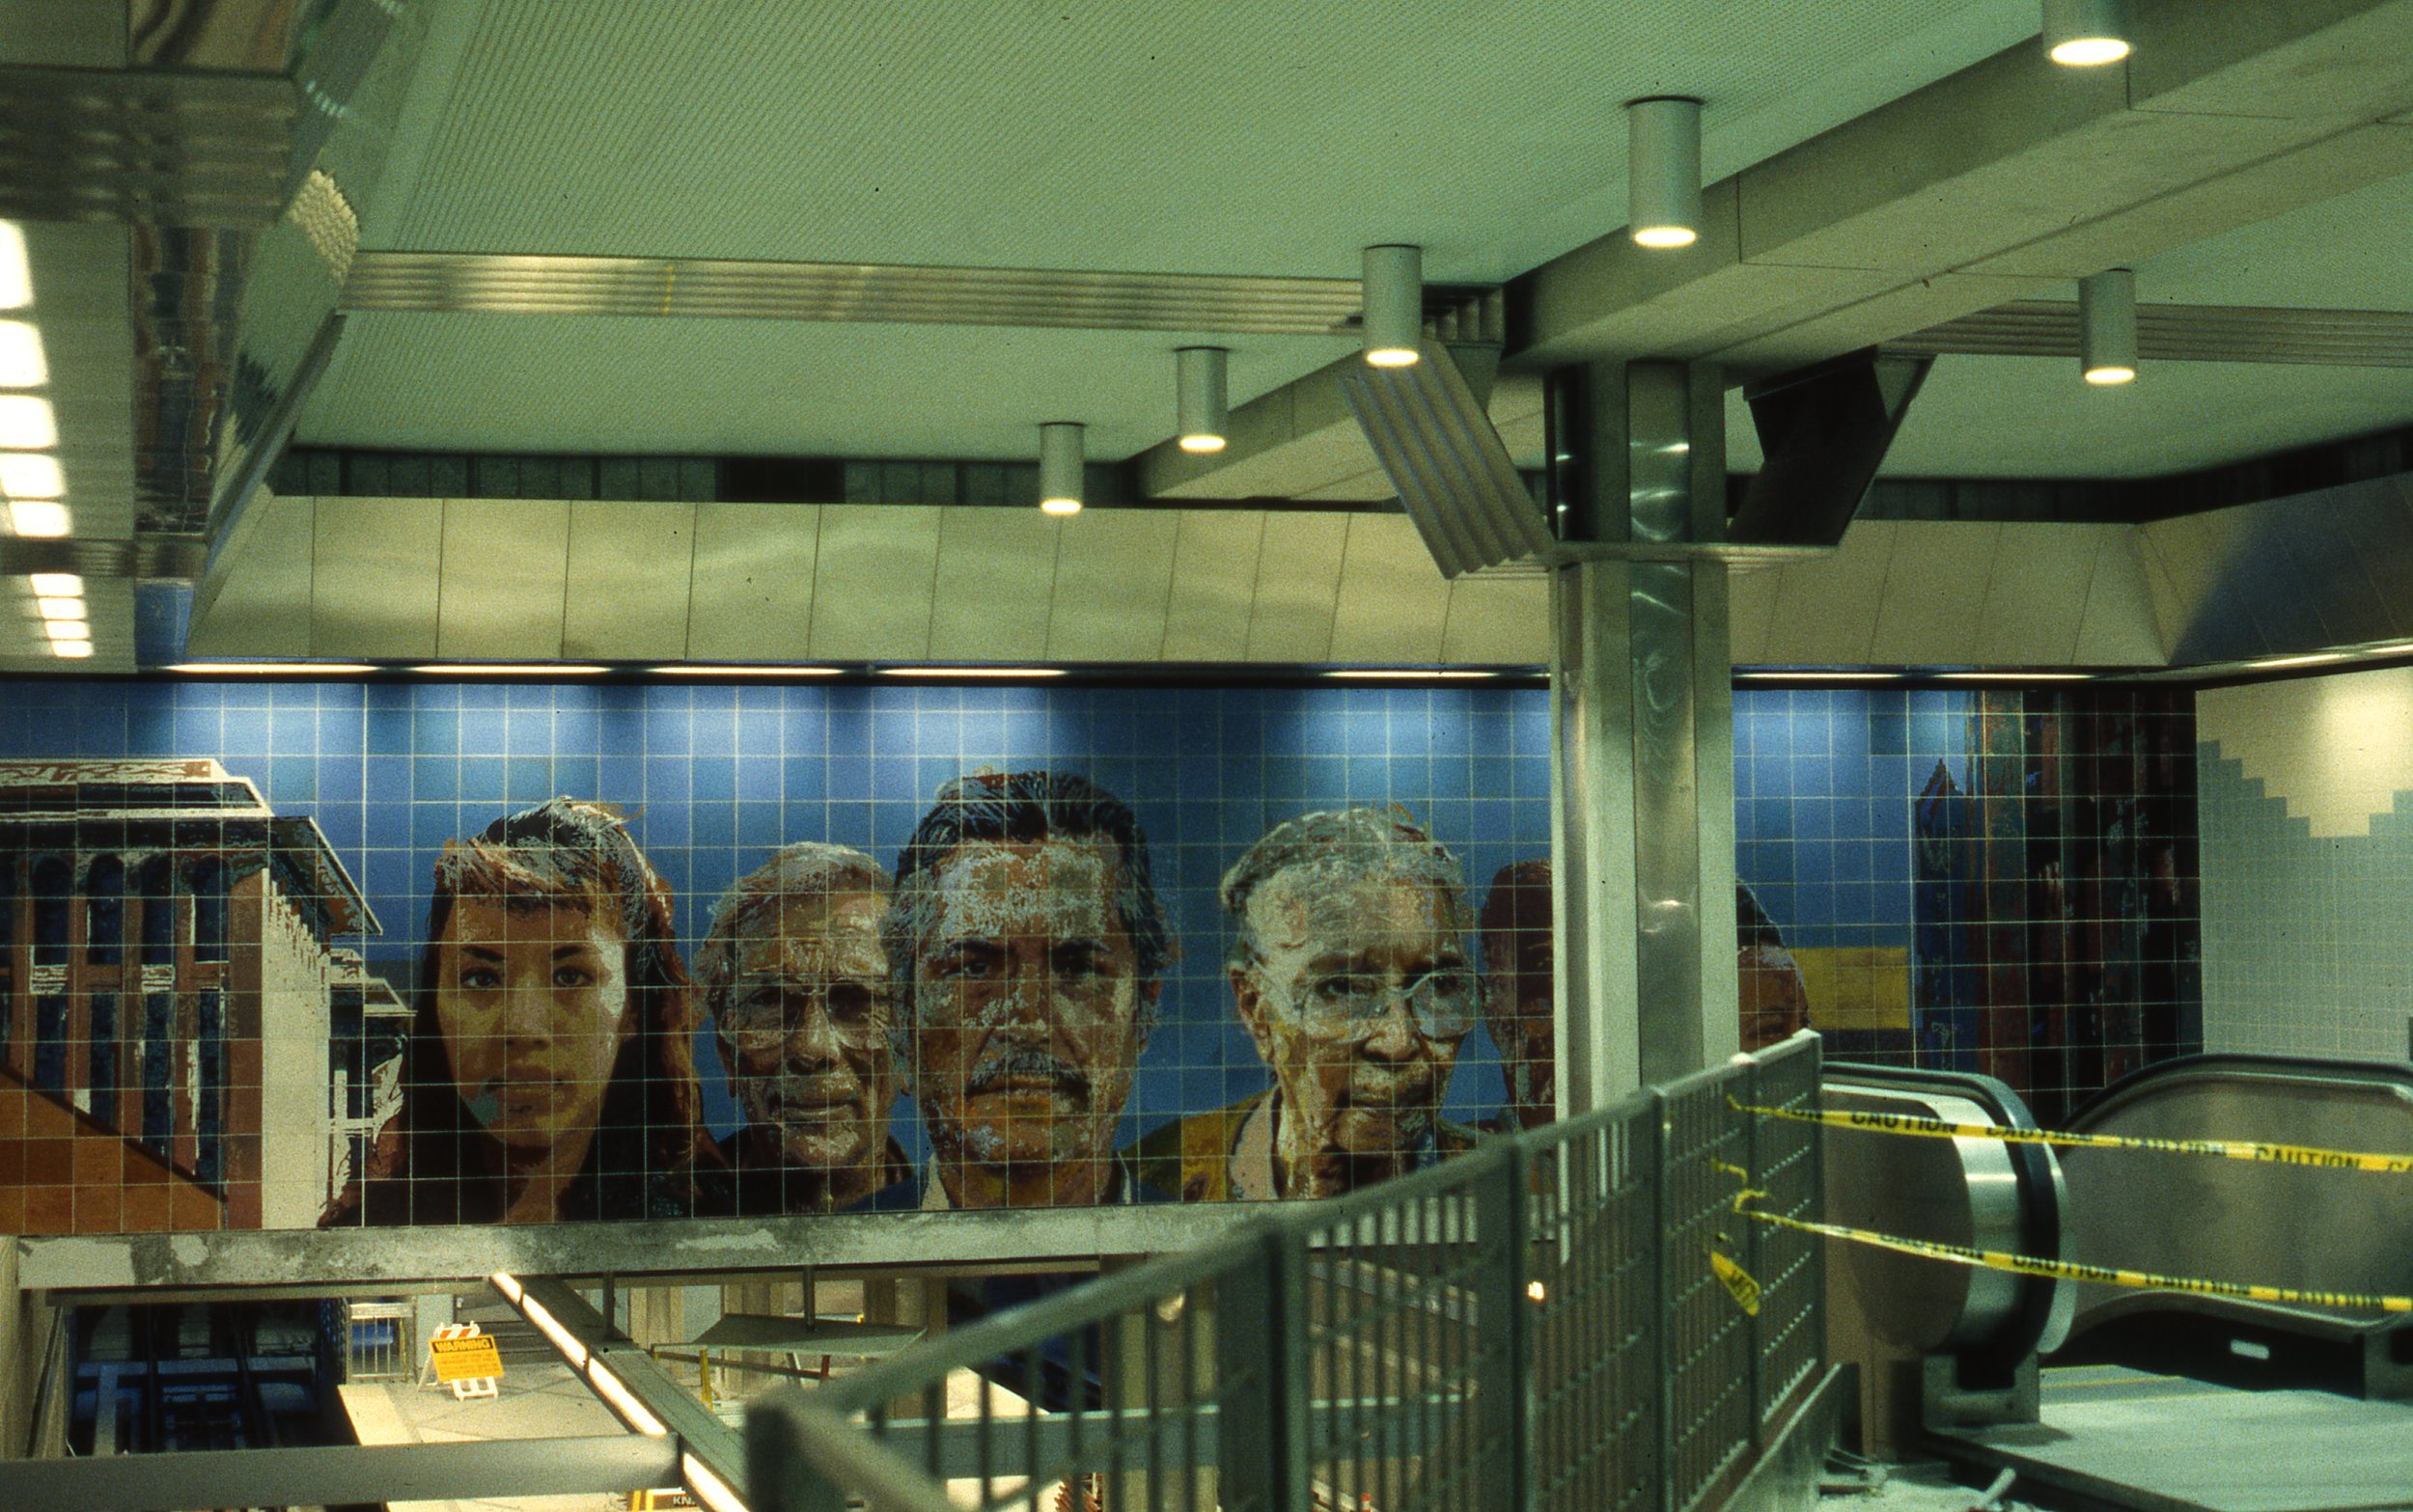 """People Coming, People Going"", East wall    1996   Ceramic Tile   10 x 50 feet   © Richard Wyatt Jr."